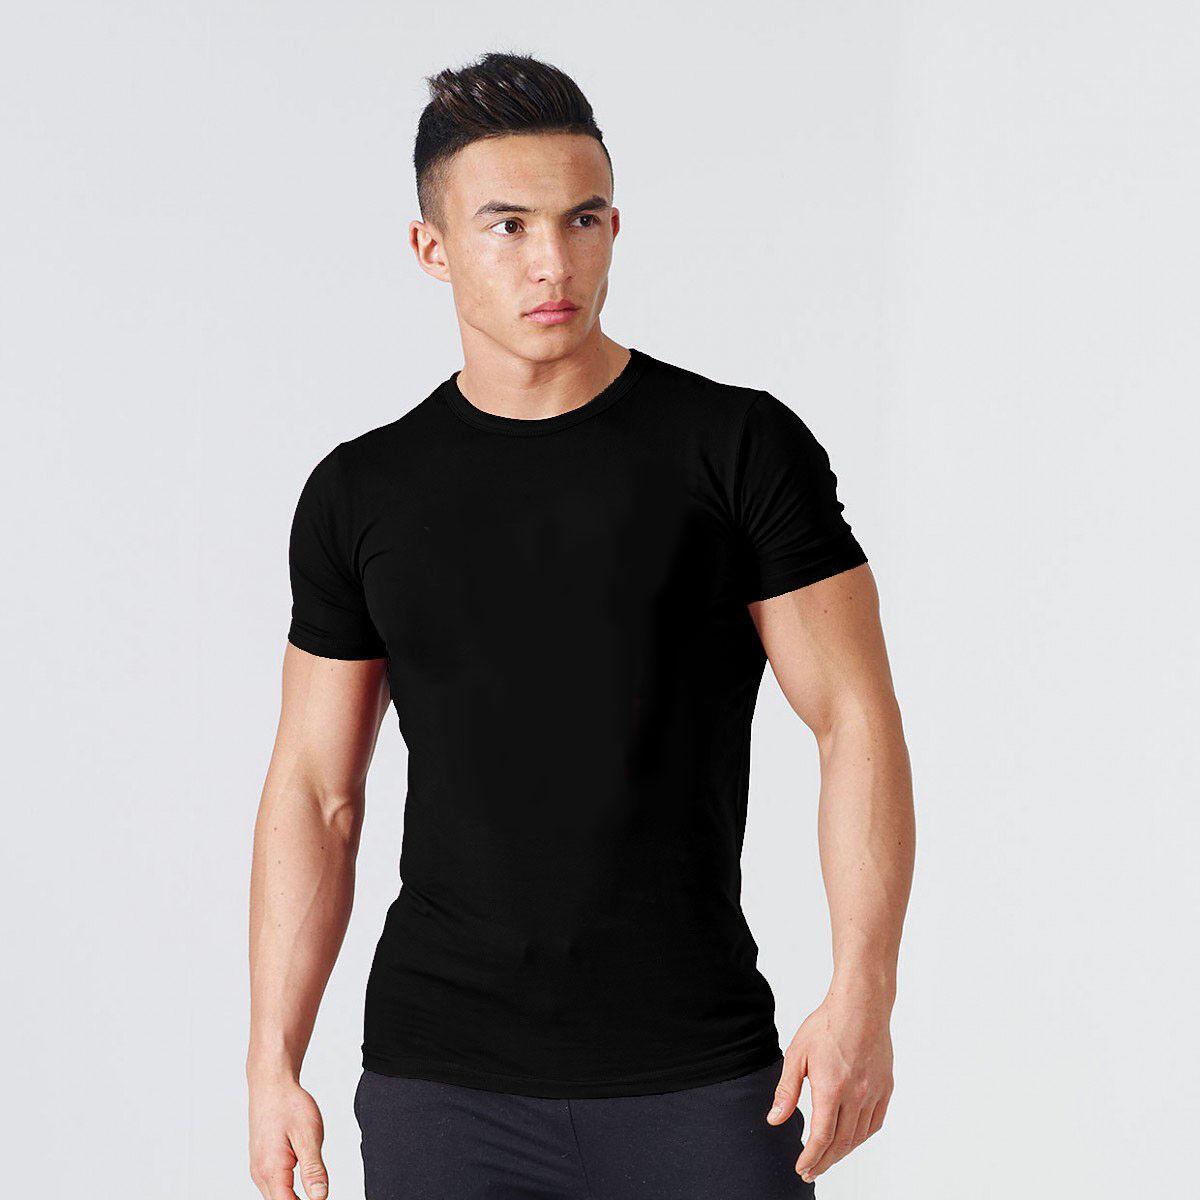 men s gym bodybuilding fitness cotton clothing